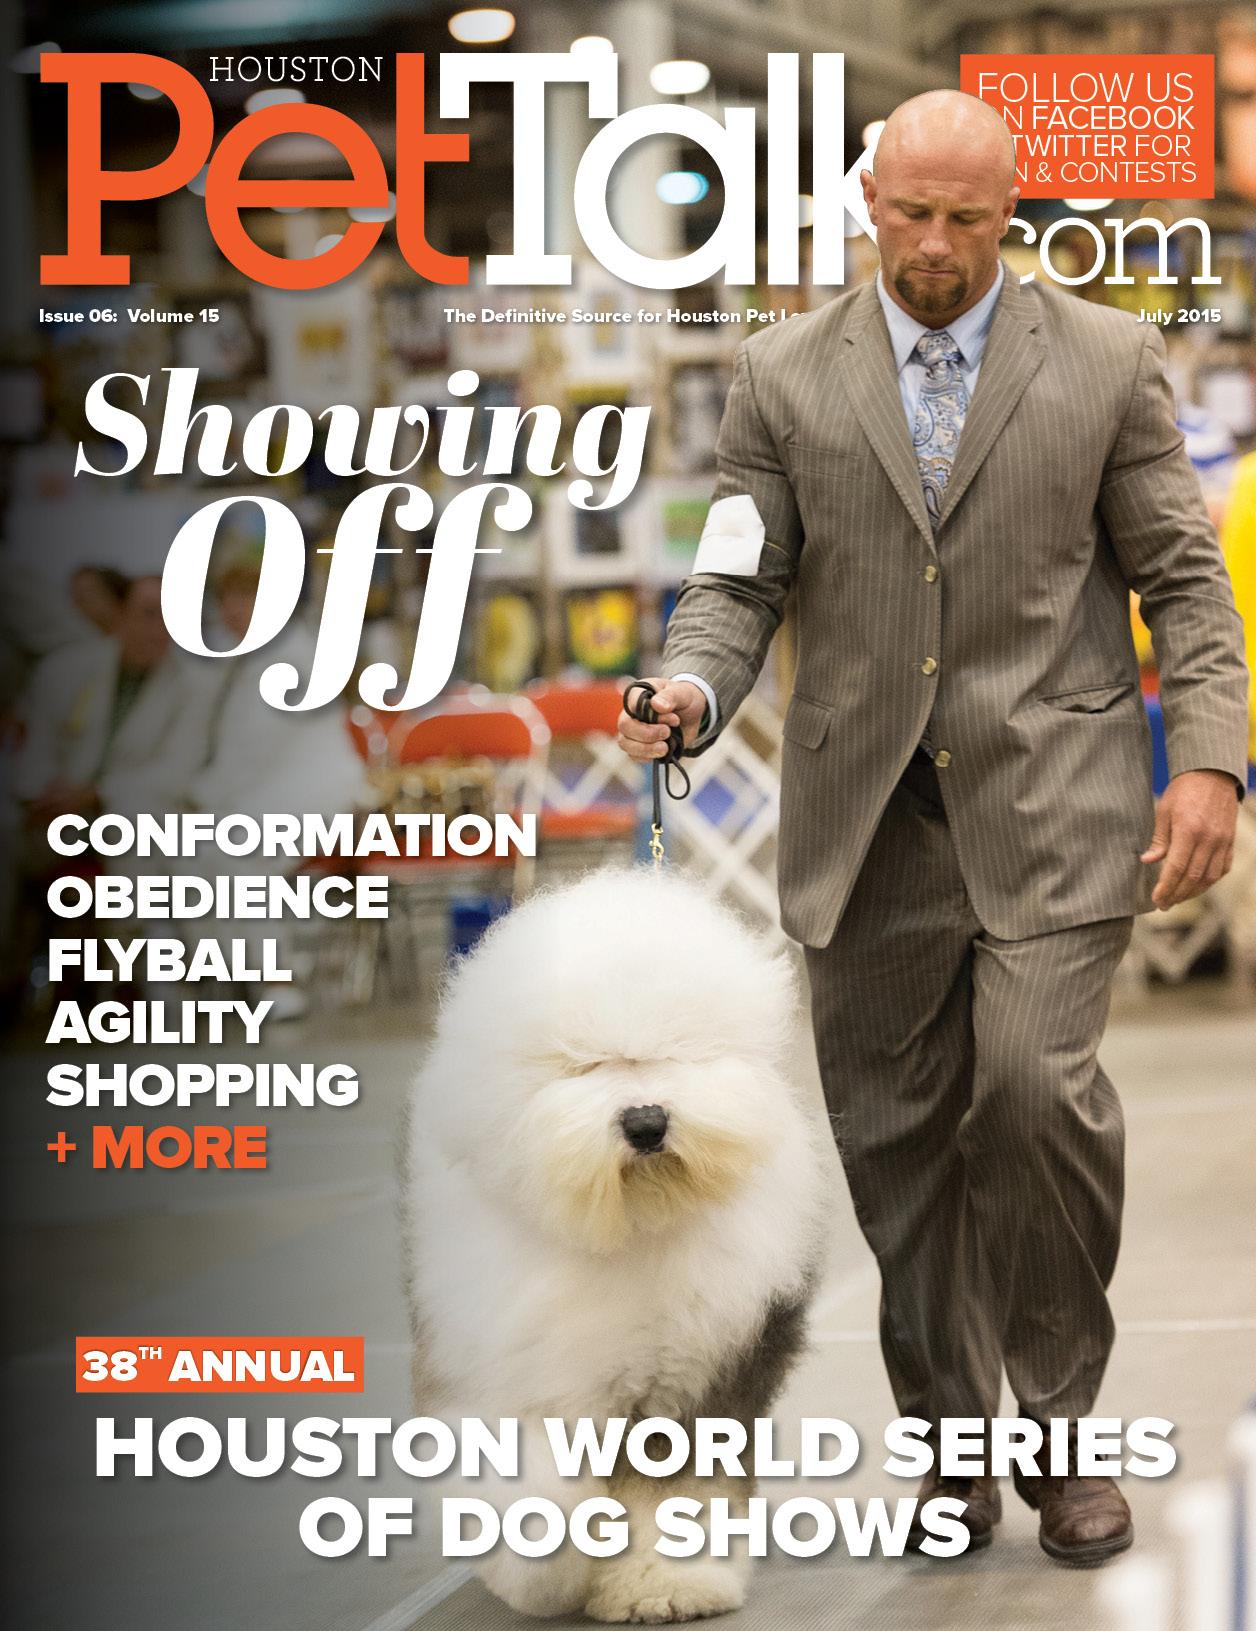 July 2015 Digital Issue of Houston PetTalk